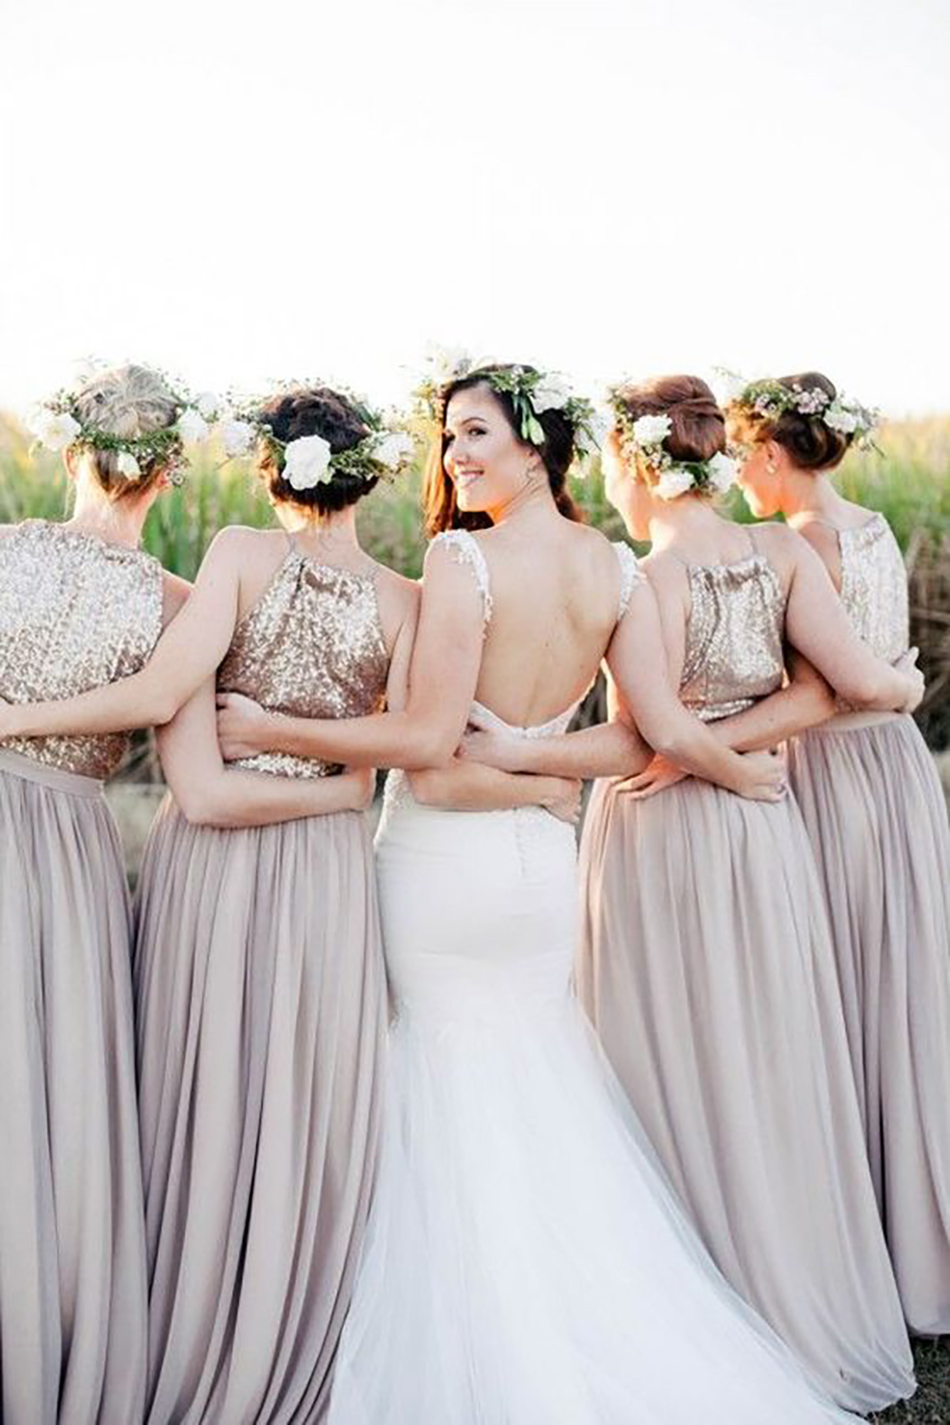 969b6319dd29 Wedding ideas by colour: metallic bridesmaid dresses